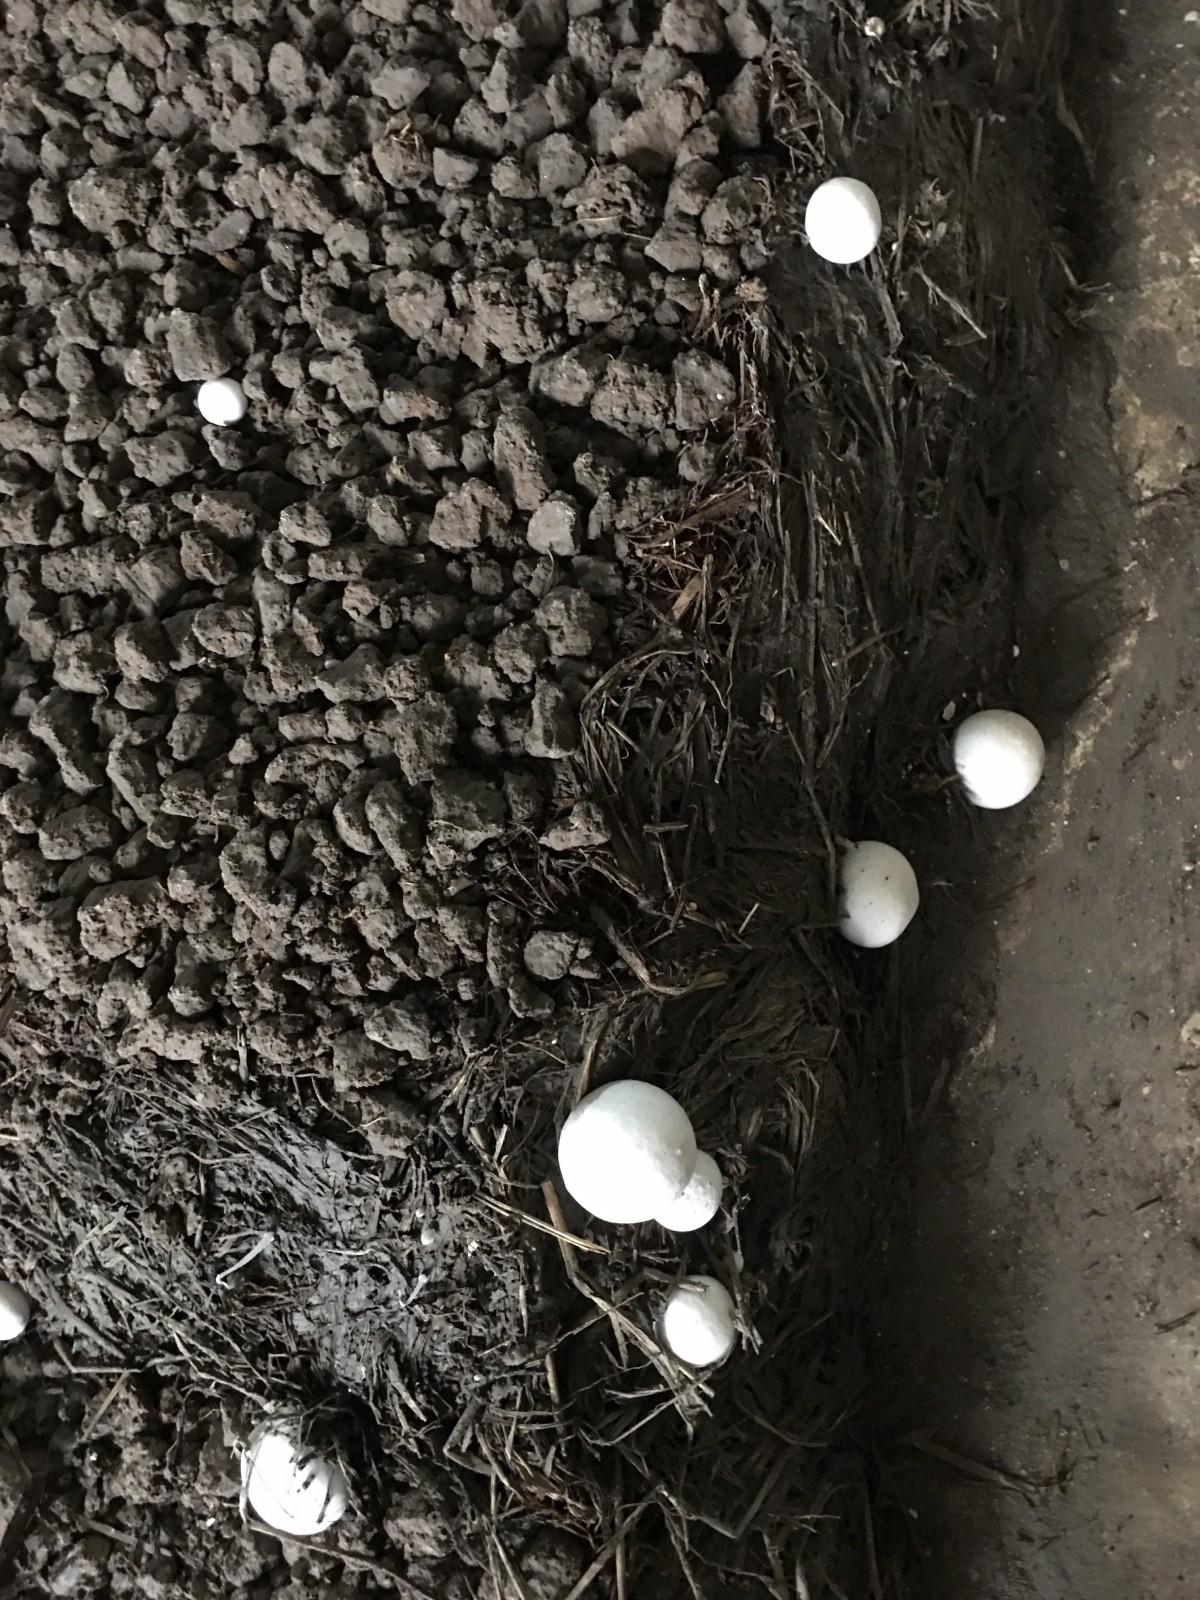 button mushroom 3.jpeg